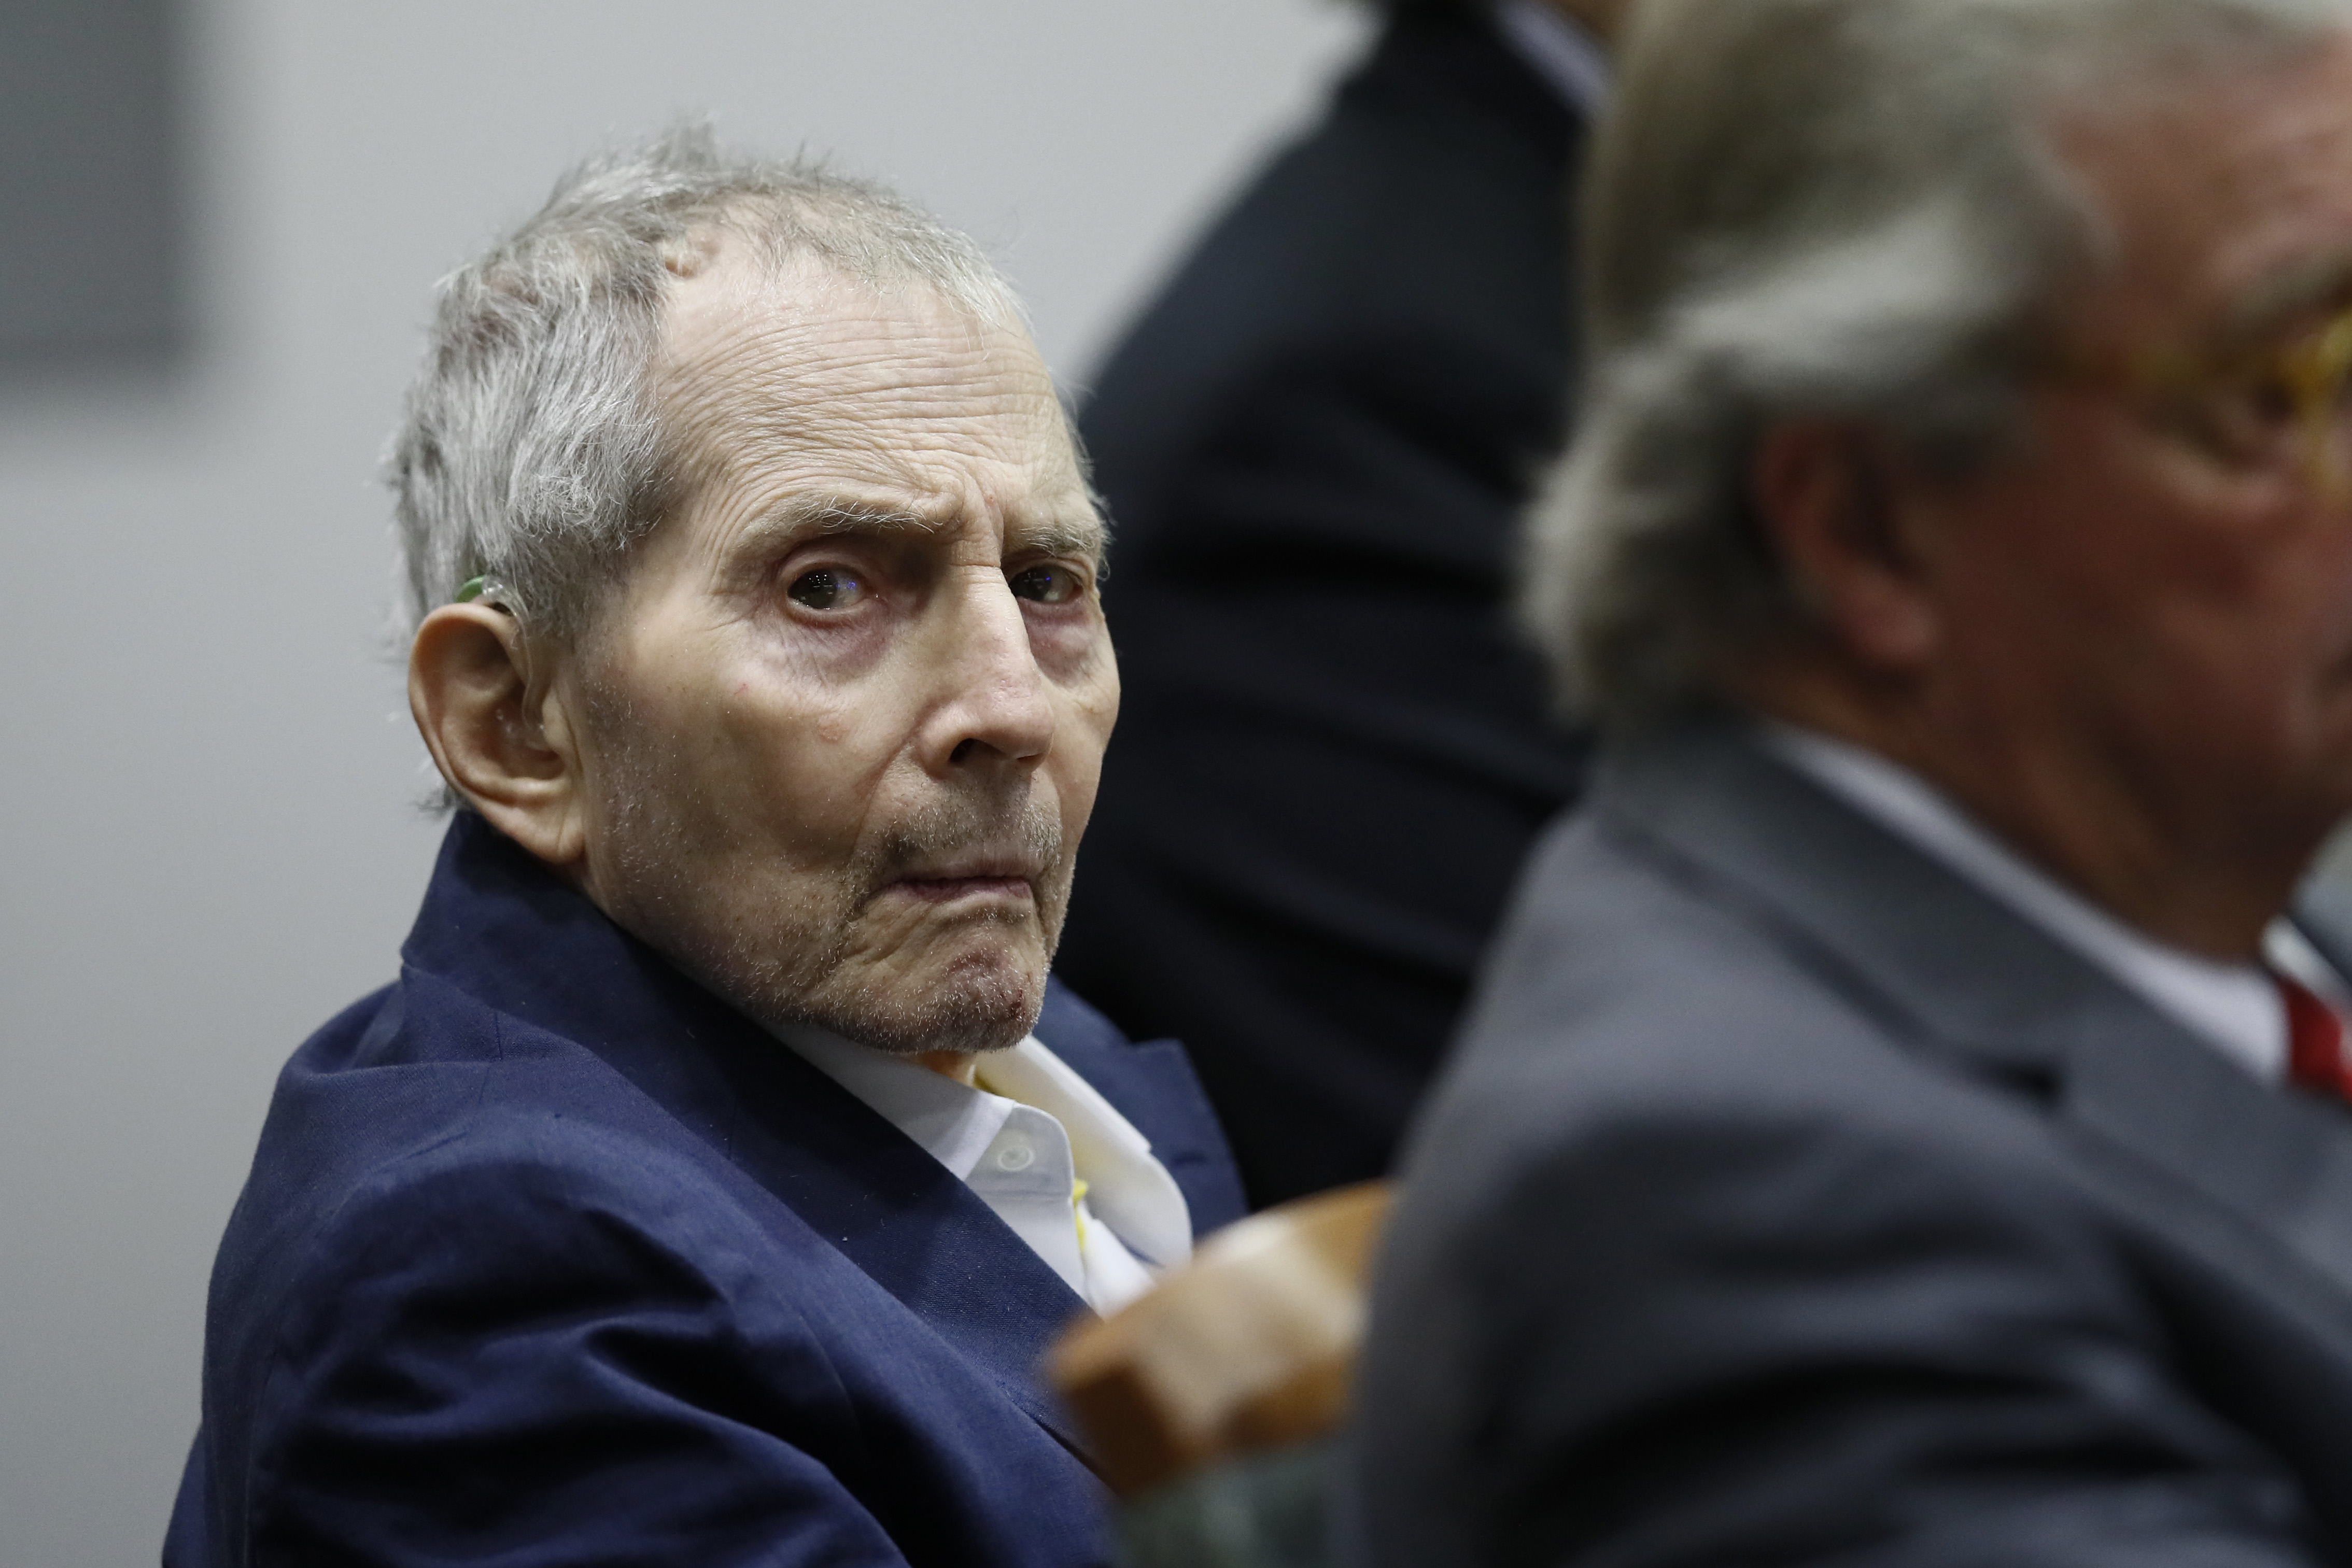 Robert Durst's LA Murder Trial, Already Postponed by Pandemic, Is Delayed Until 2021